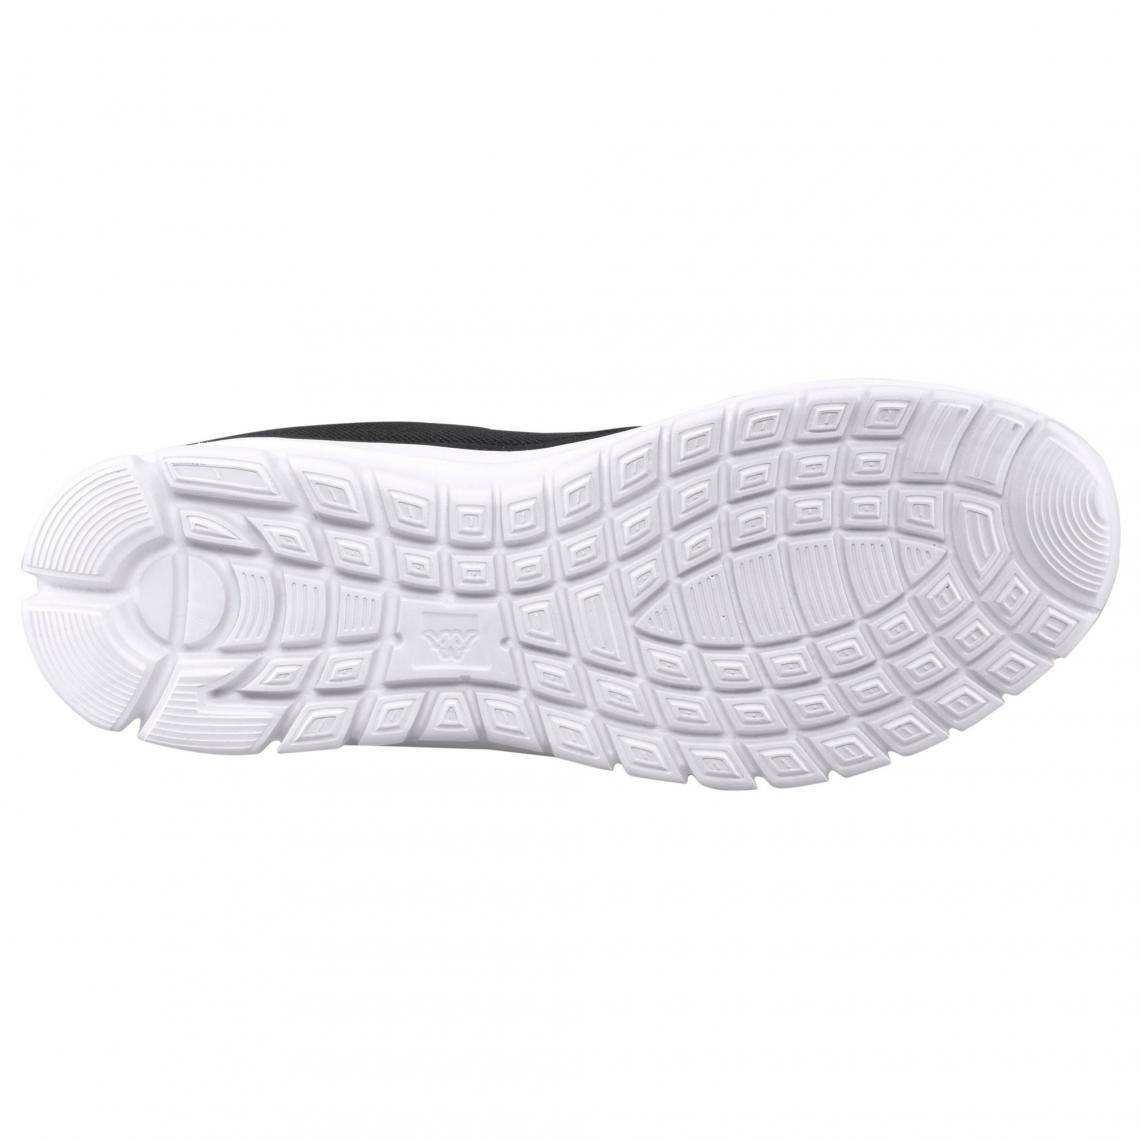 a73049f0320 Kappa Rocket chaussures de sport homme Kappa